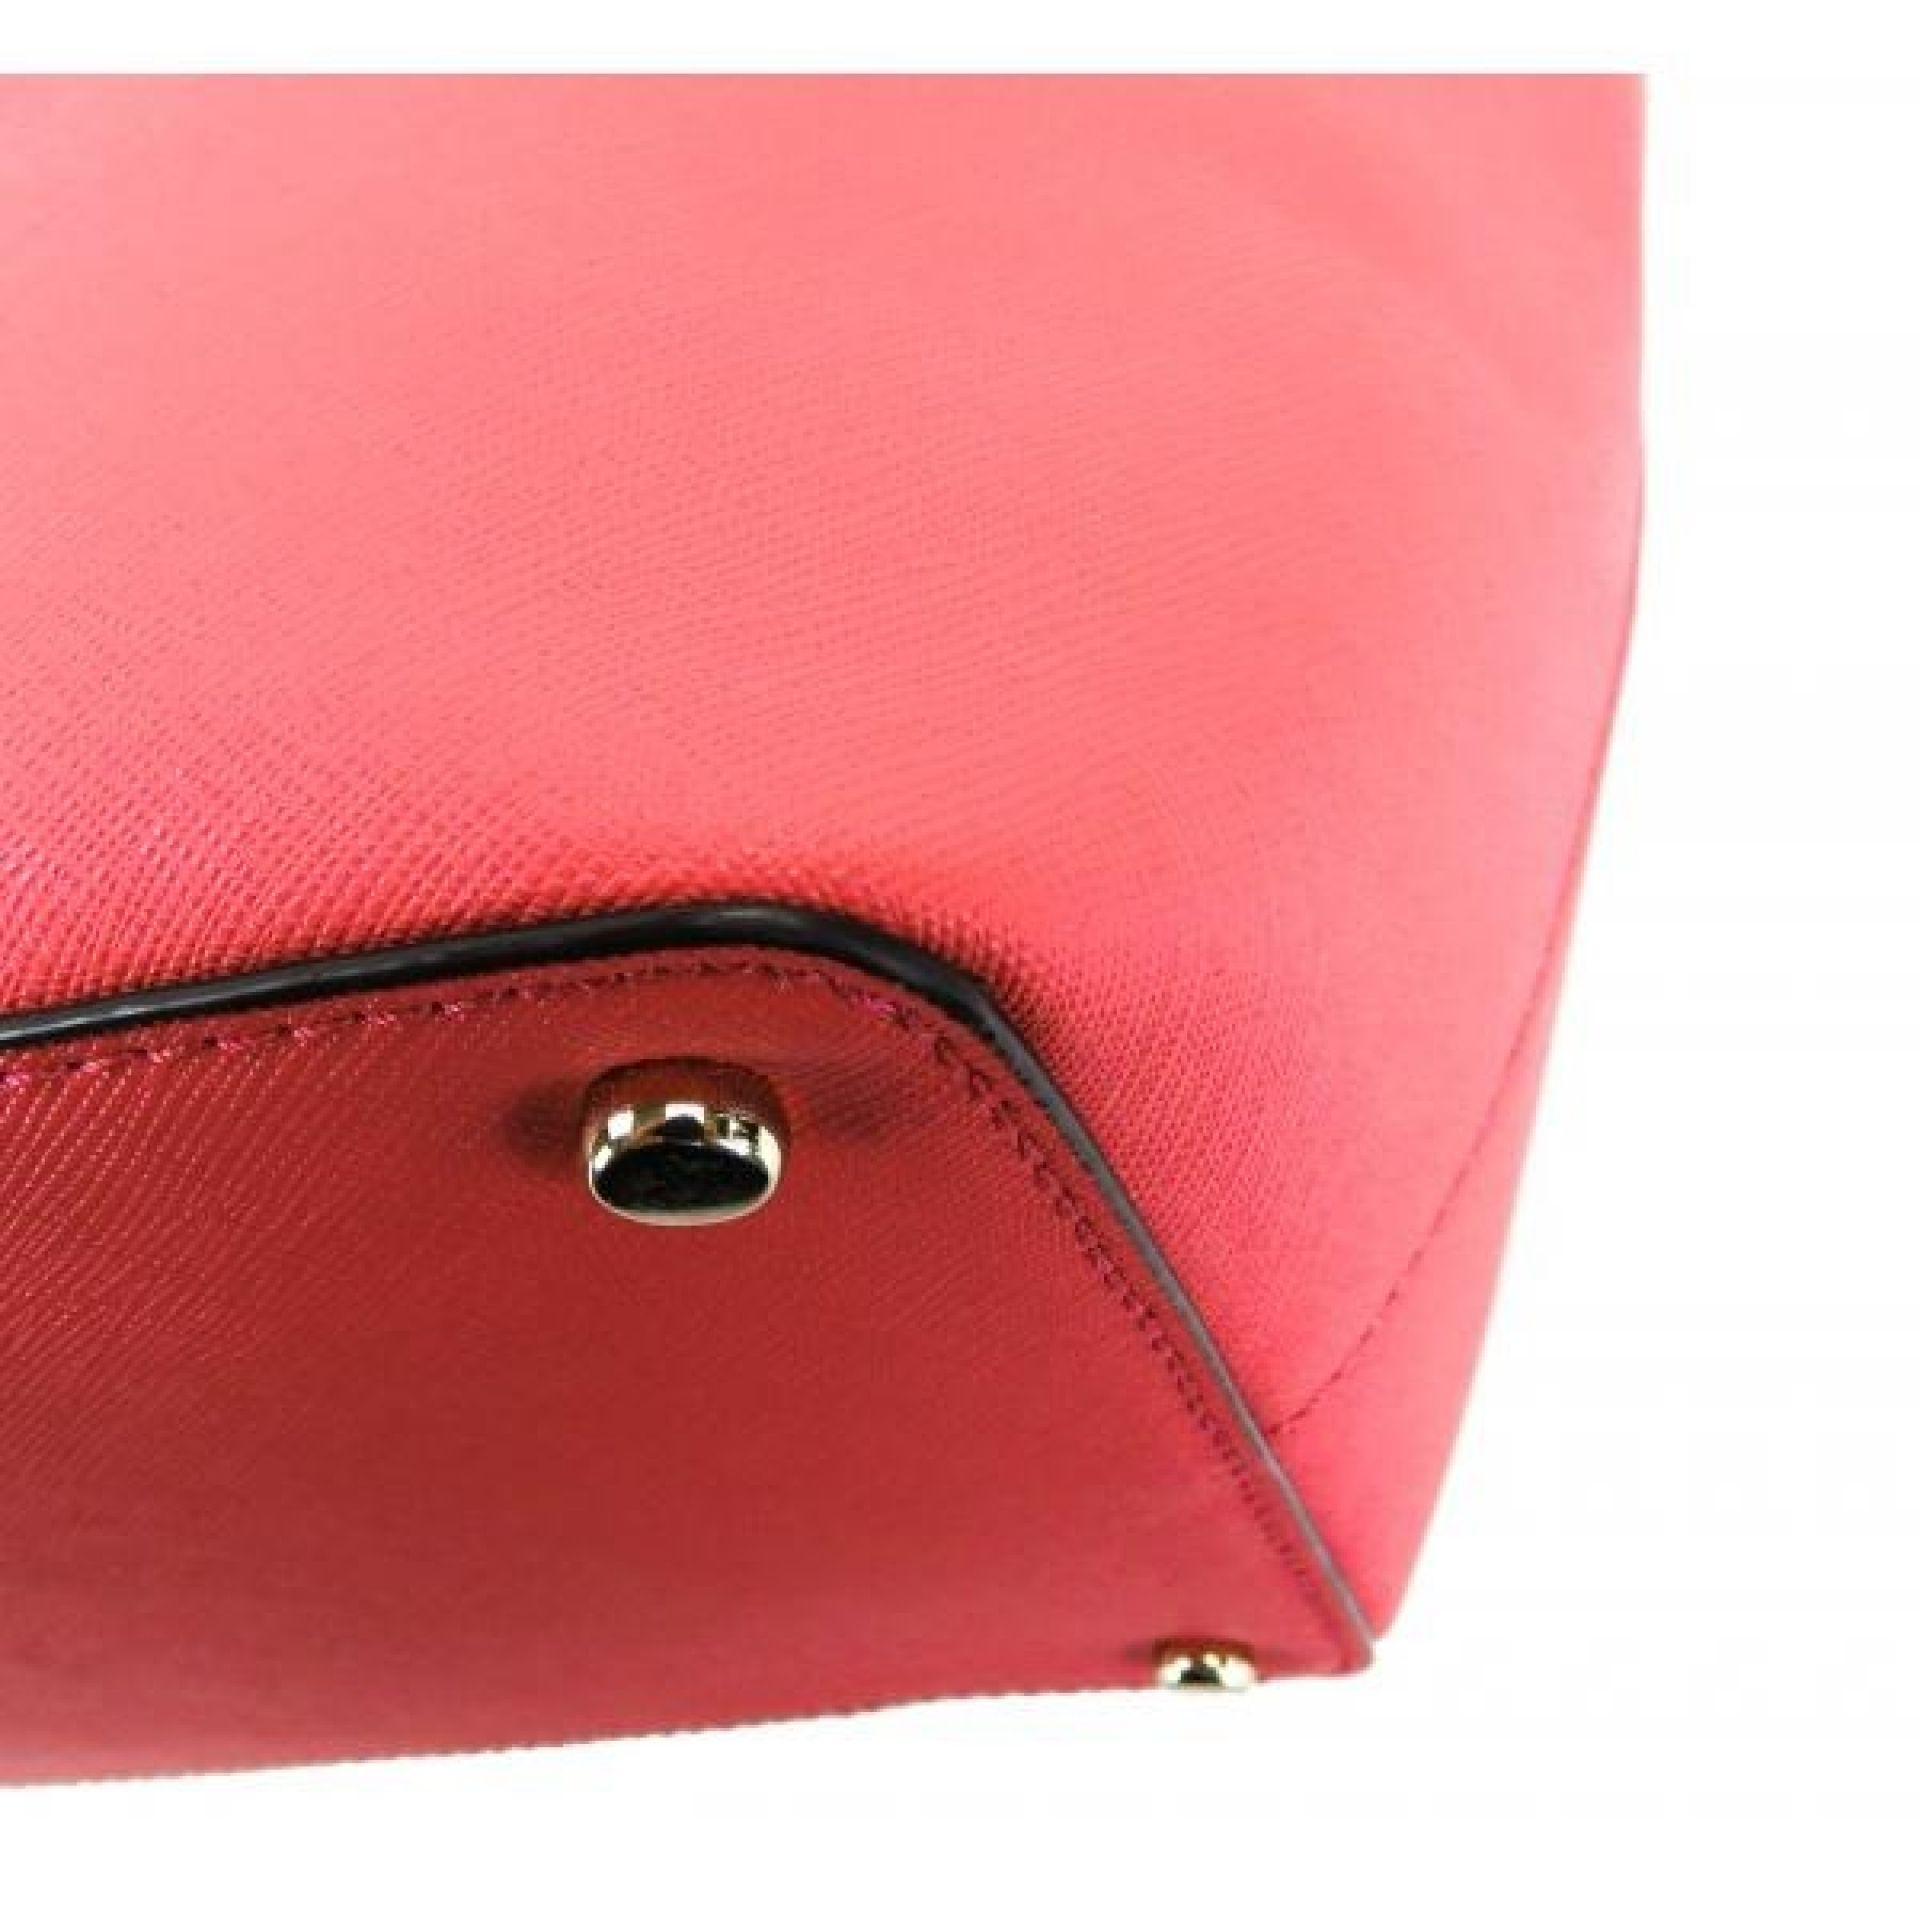 Kate Spade Pink Saffiano Leather Cedar Street Large Harmony Tote Bag